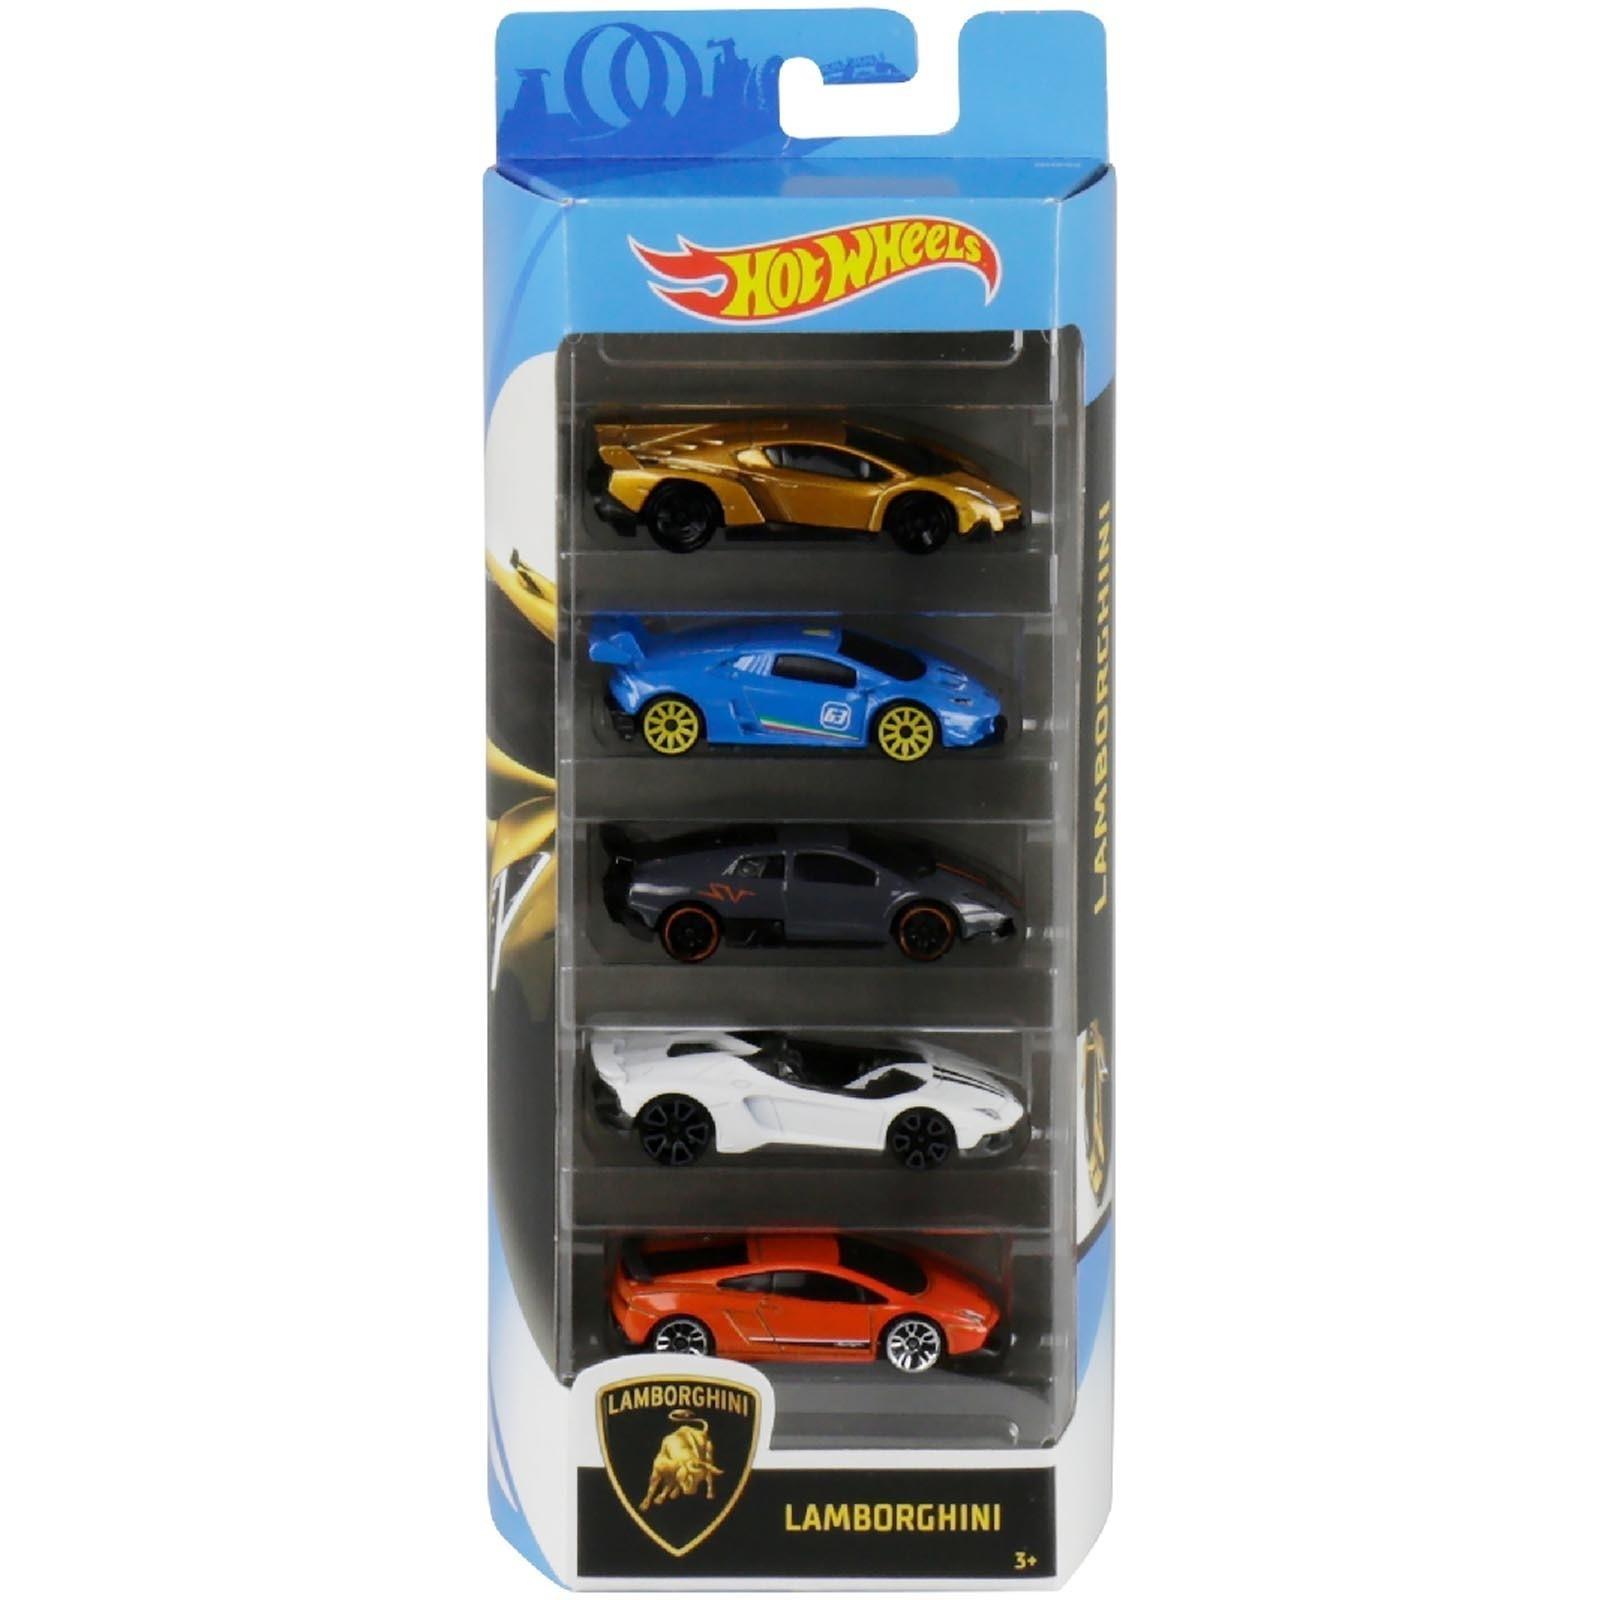 Pack Com 5 Carrinho Hot Wheels: Lamborghini - Mattel